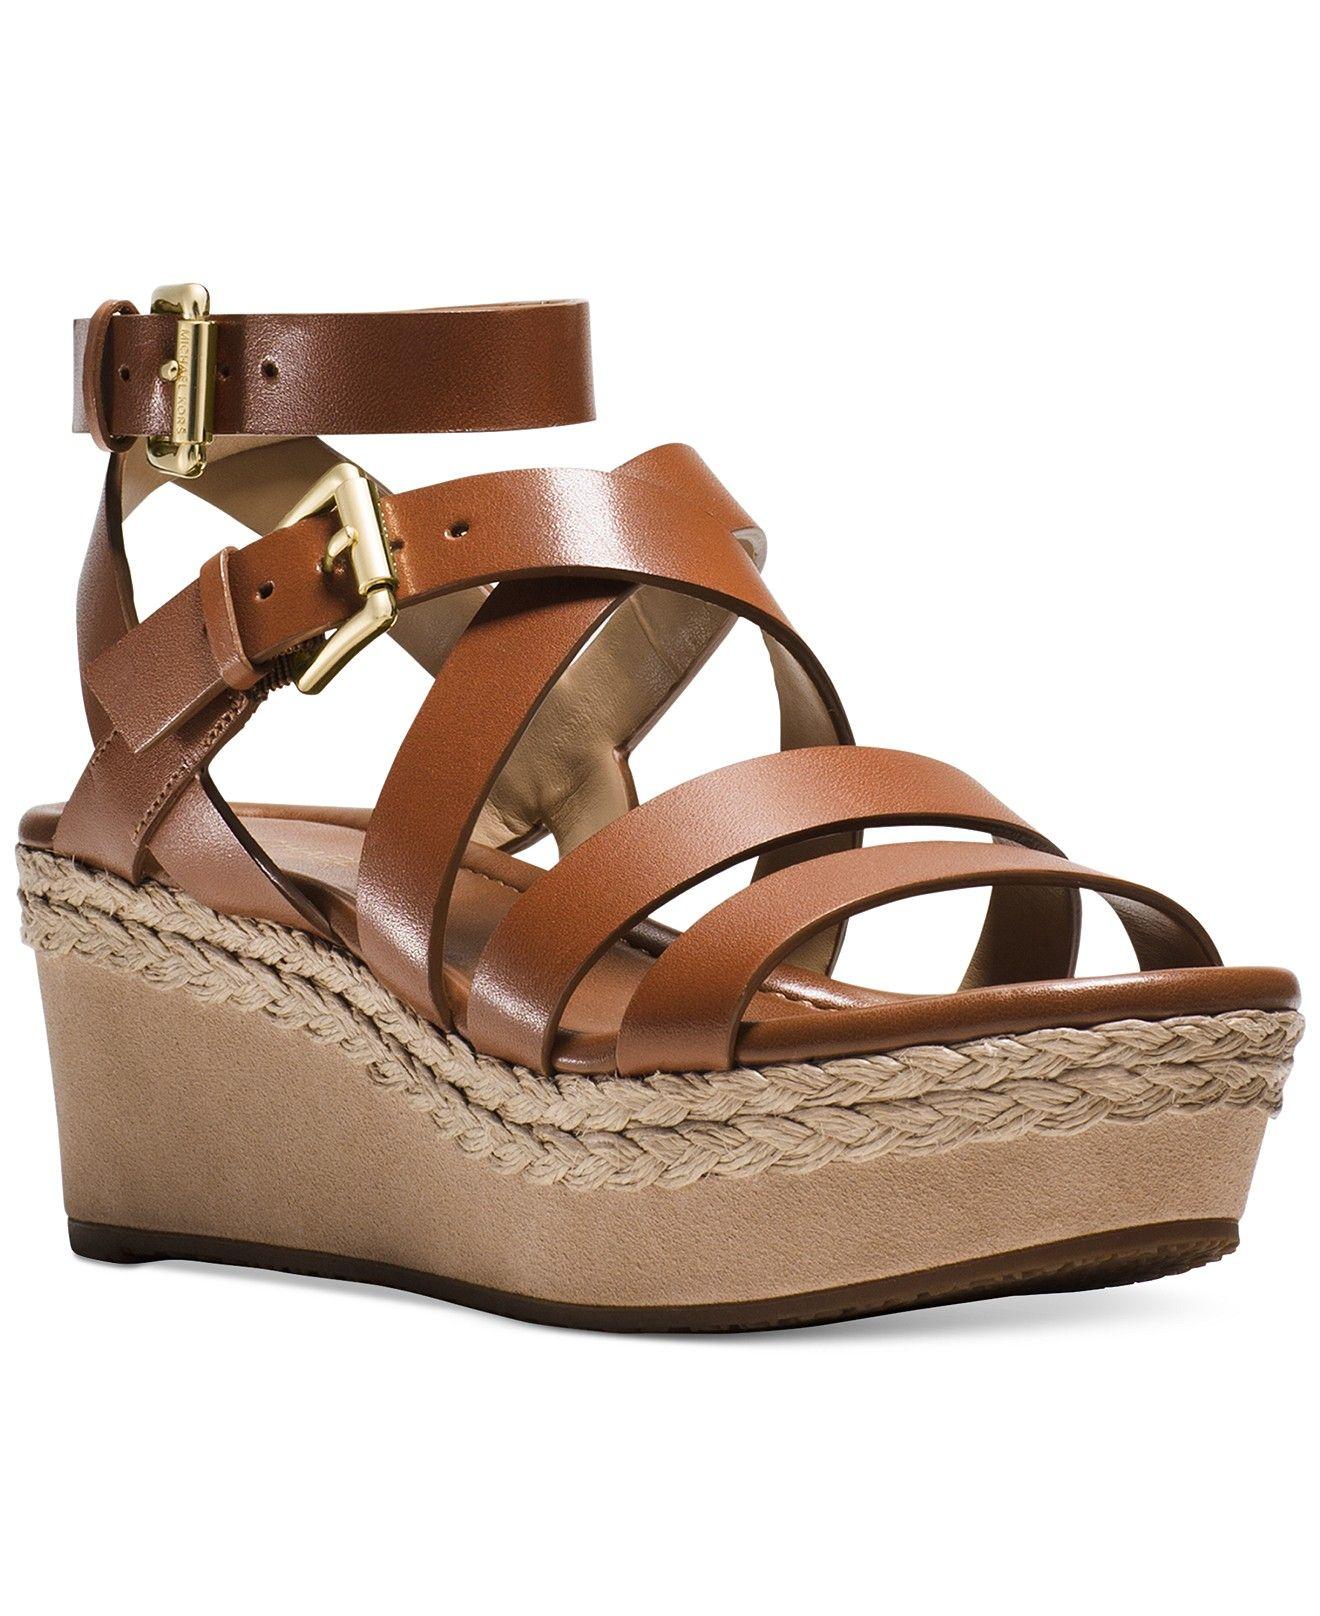 8f5b773a6b9 MICHAEL Michael Kors Jocelyn Platform Sandals - Sandals - Shoes - Macy s